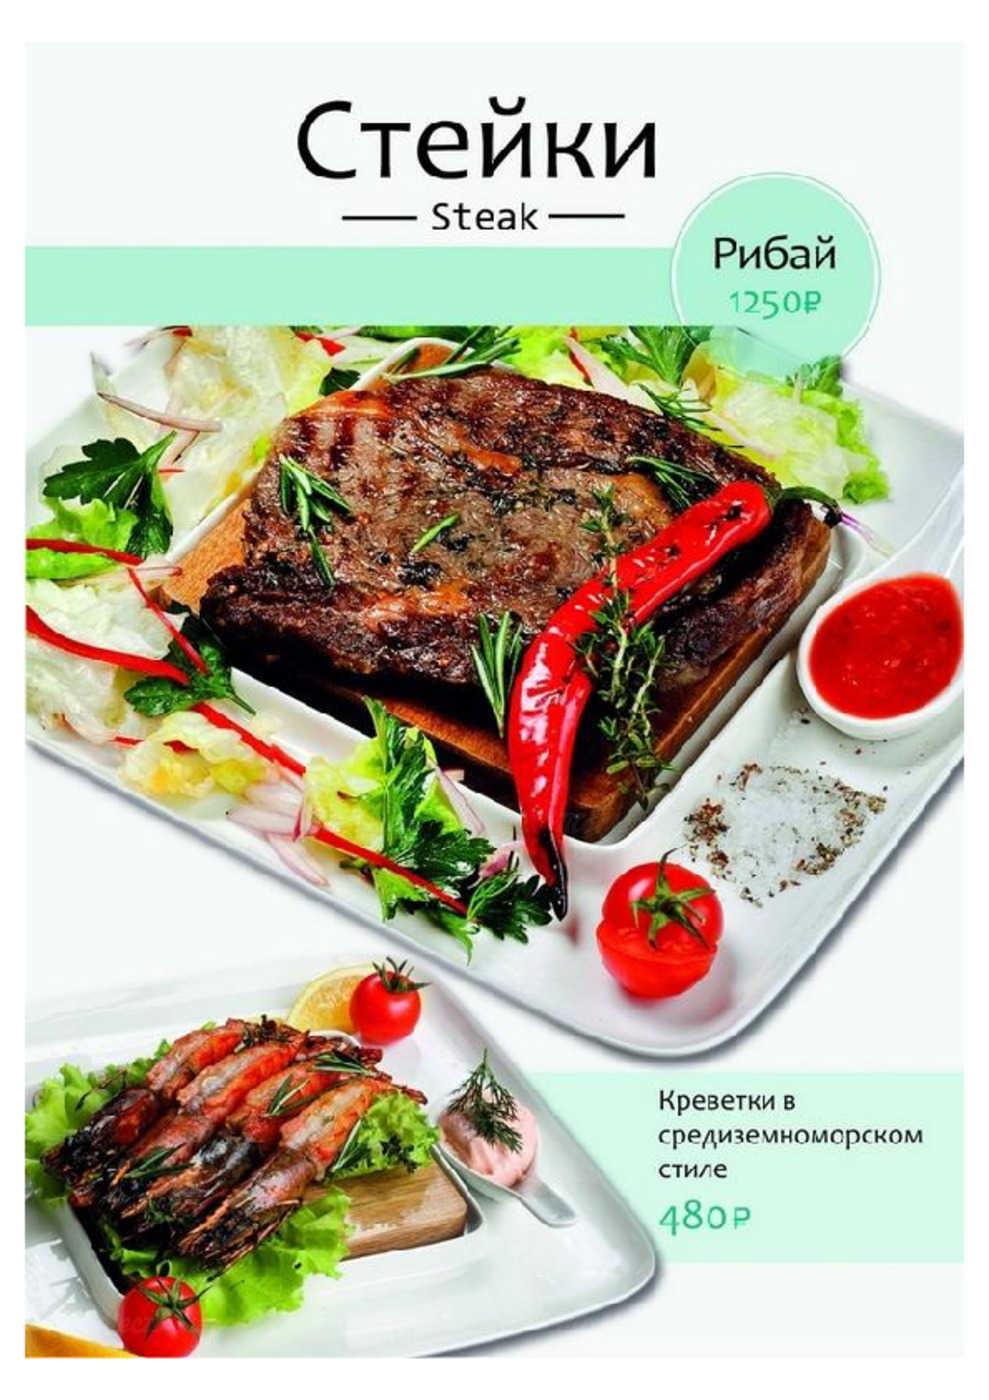 Меню ресторана Любимый Хабиб на проспекте Стачек фото 35